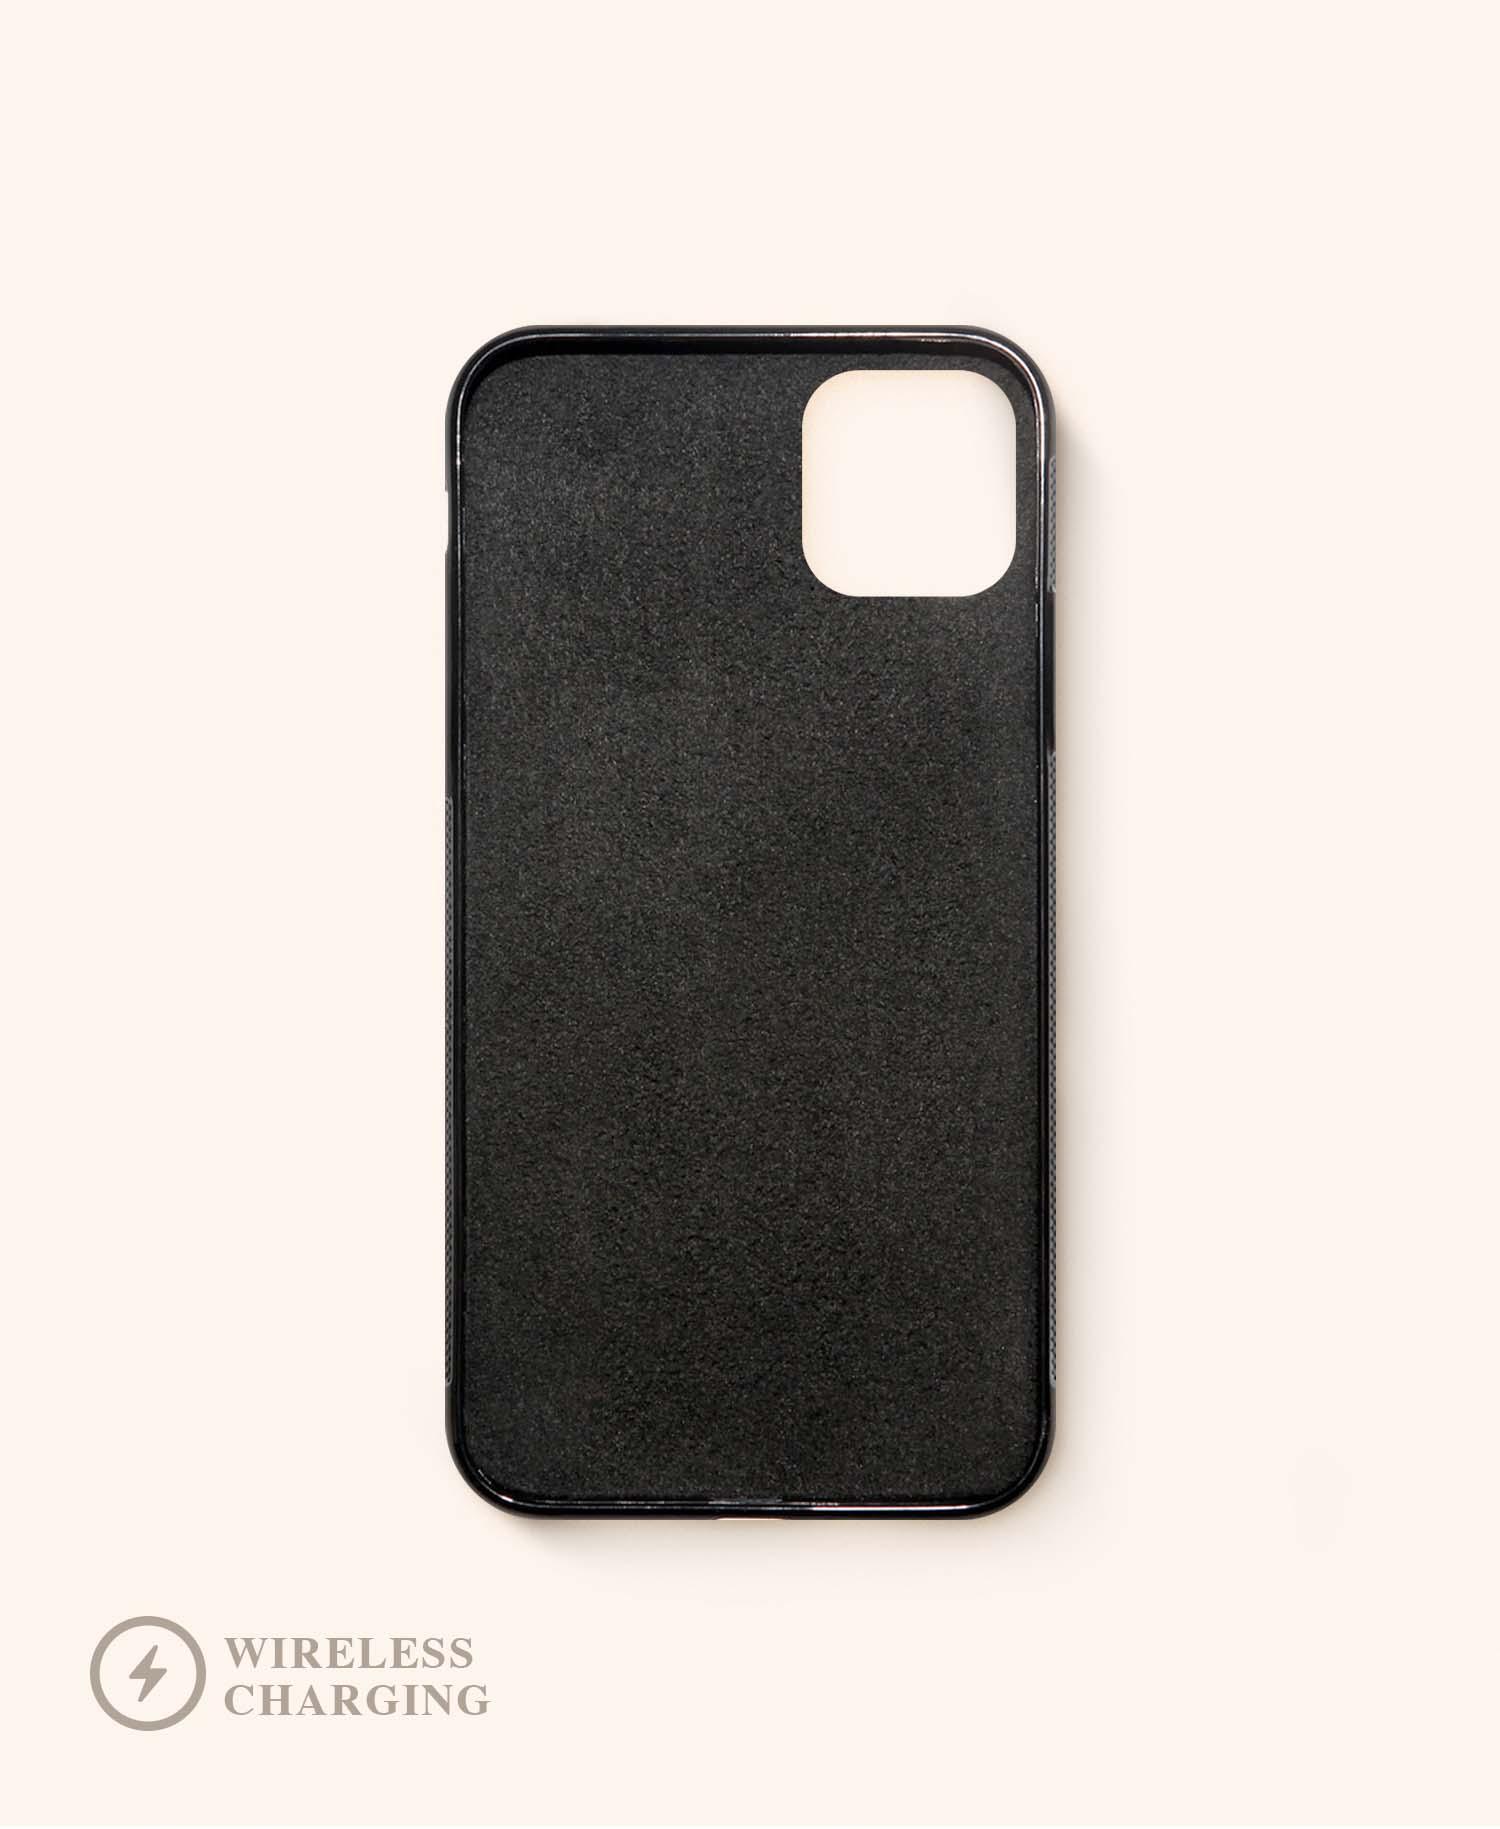 Magcase black iphone 11 - inside